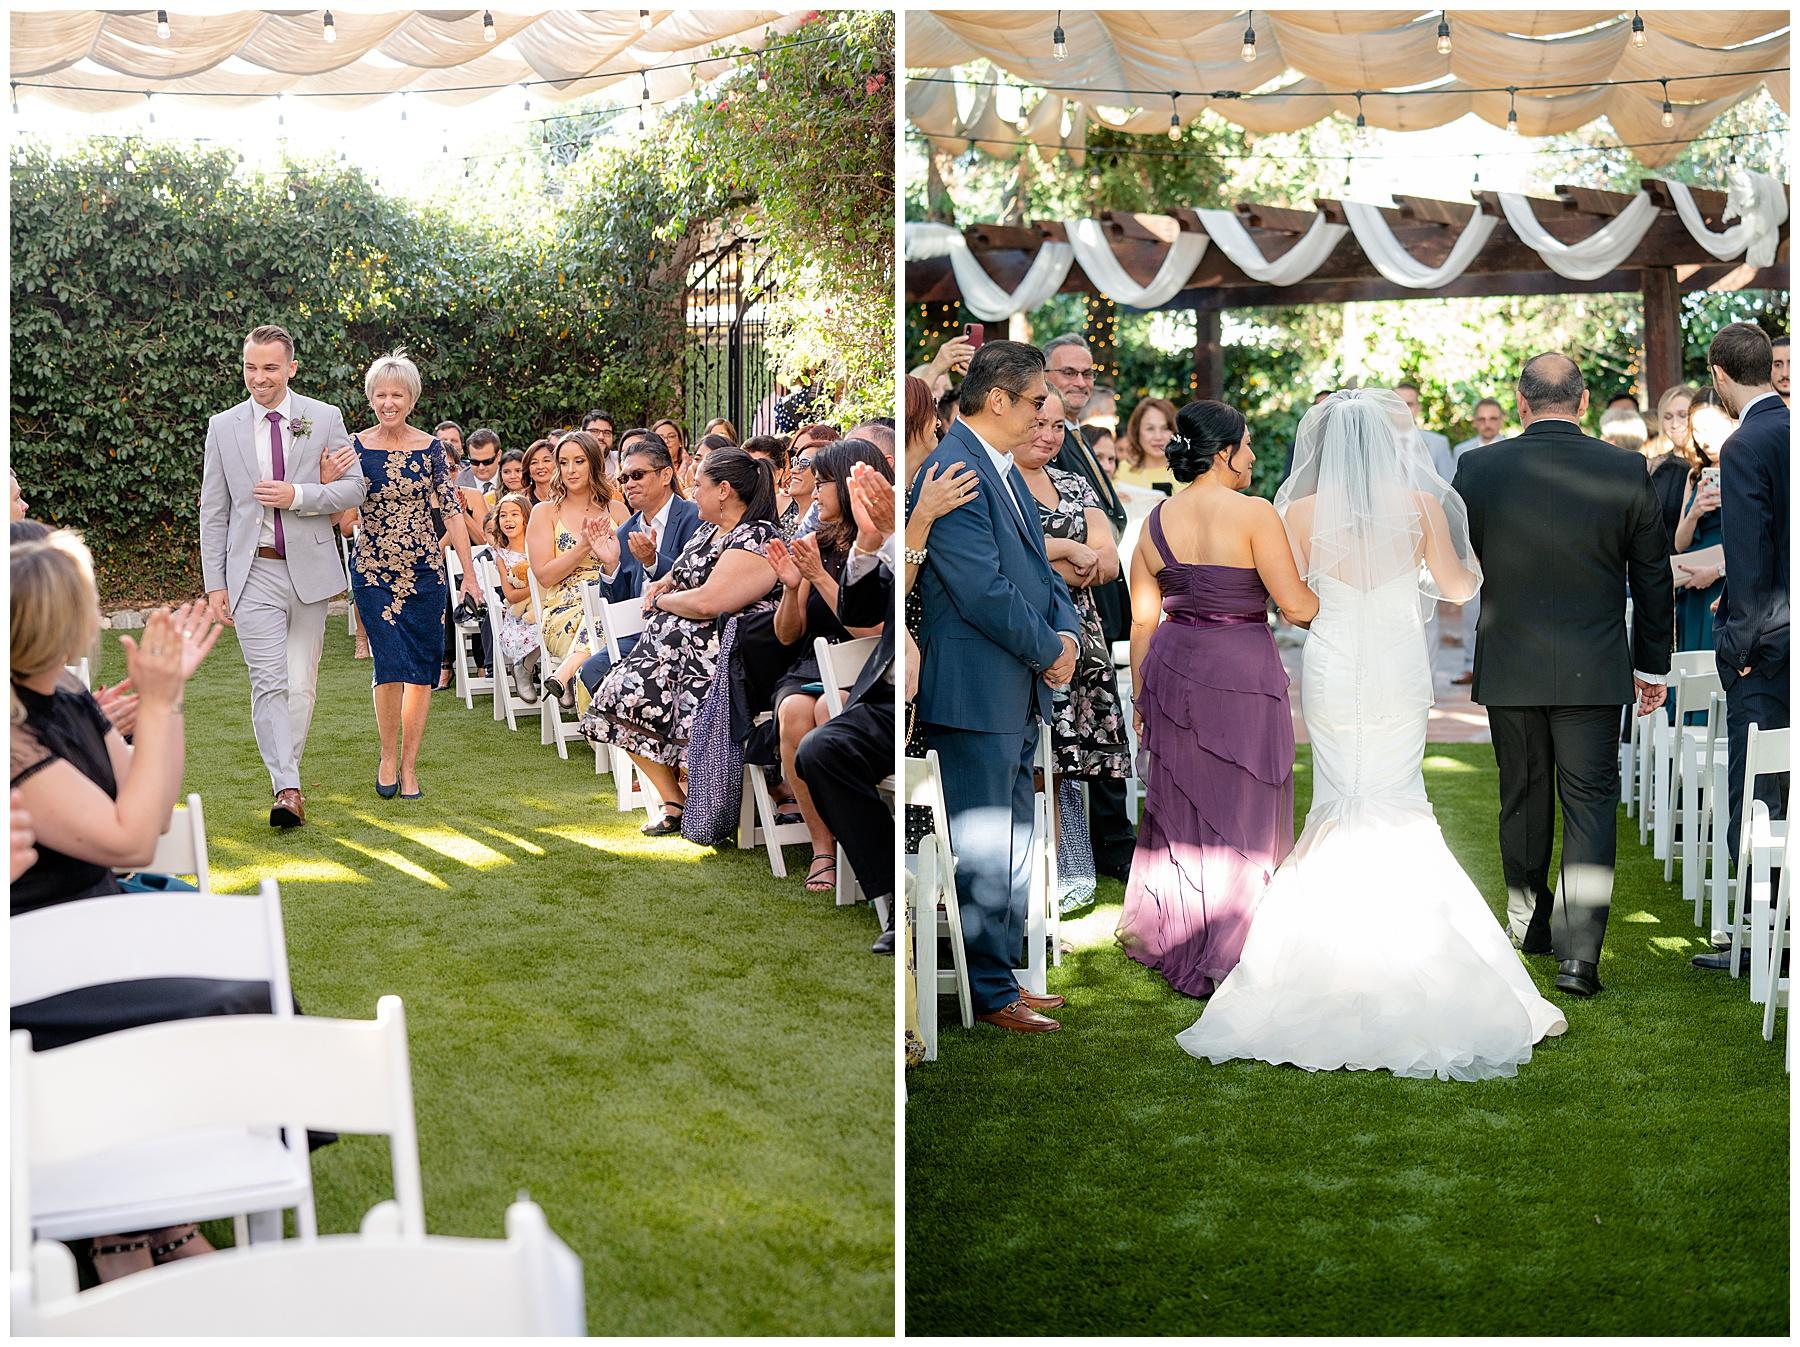 calamigos equestrian center wedding here comes the bride